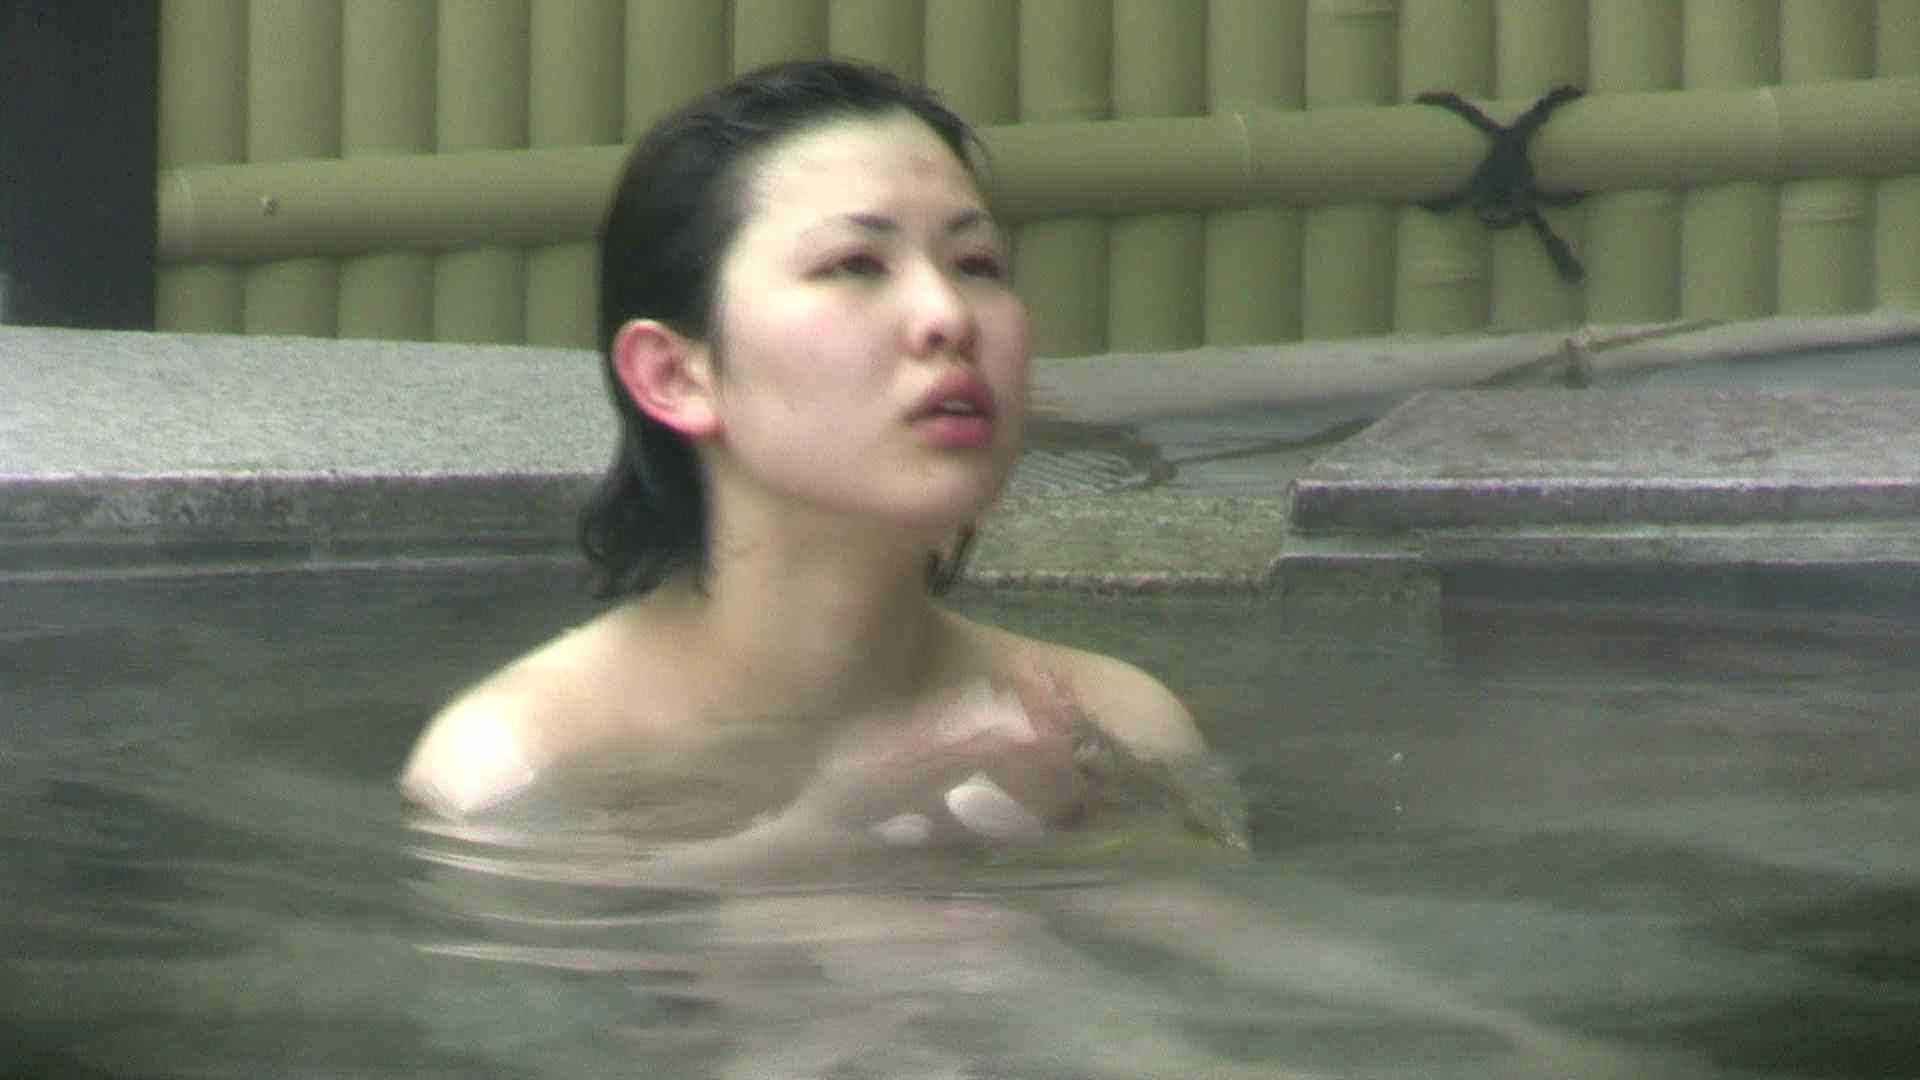 Aquaな露天風呂Vol.114 盗撮映像  72Pix 44